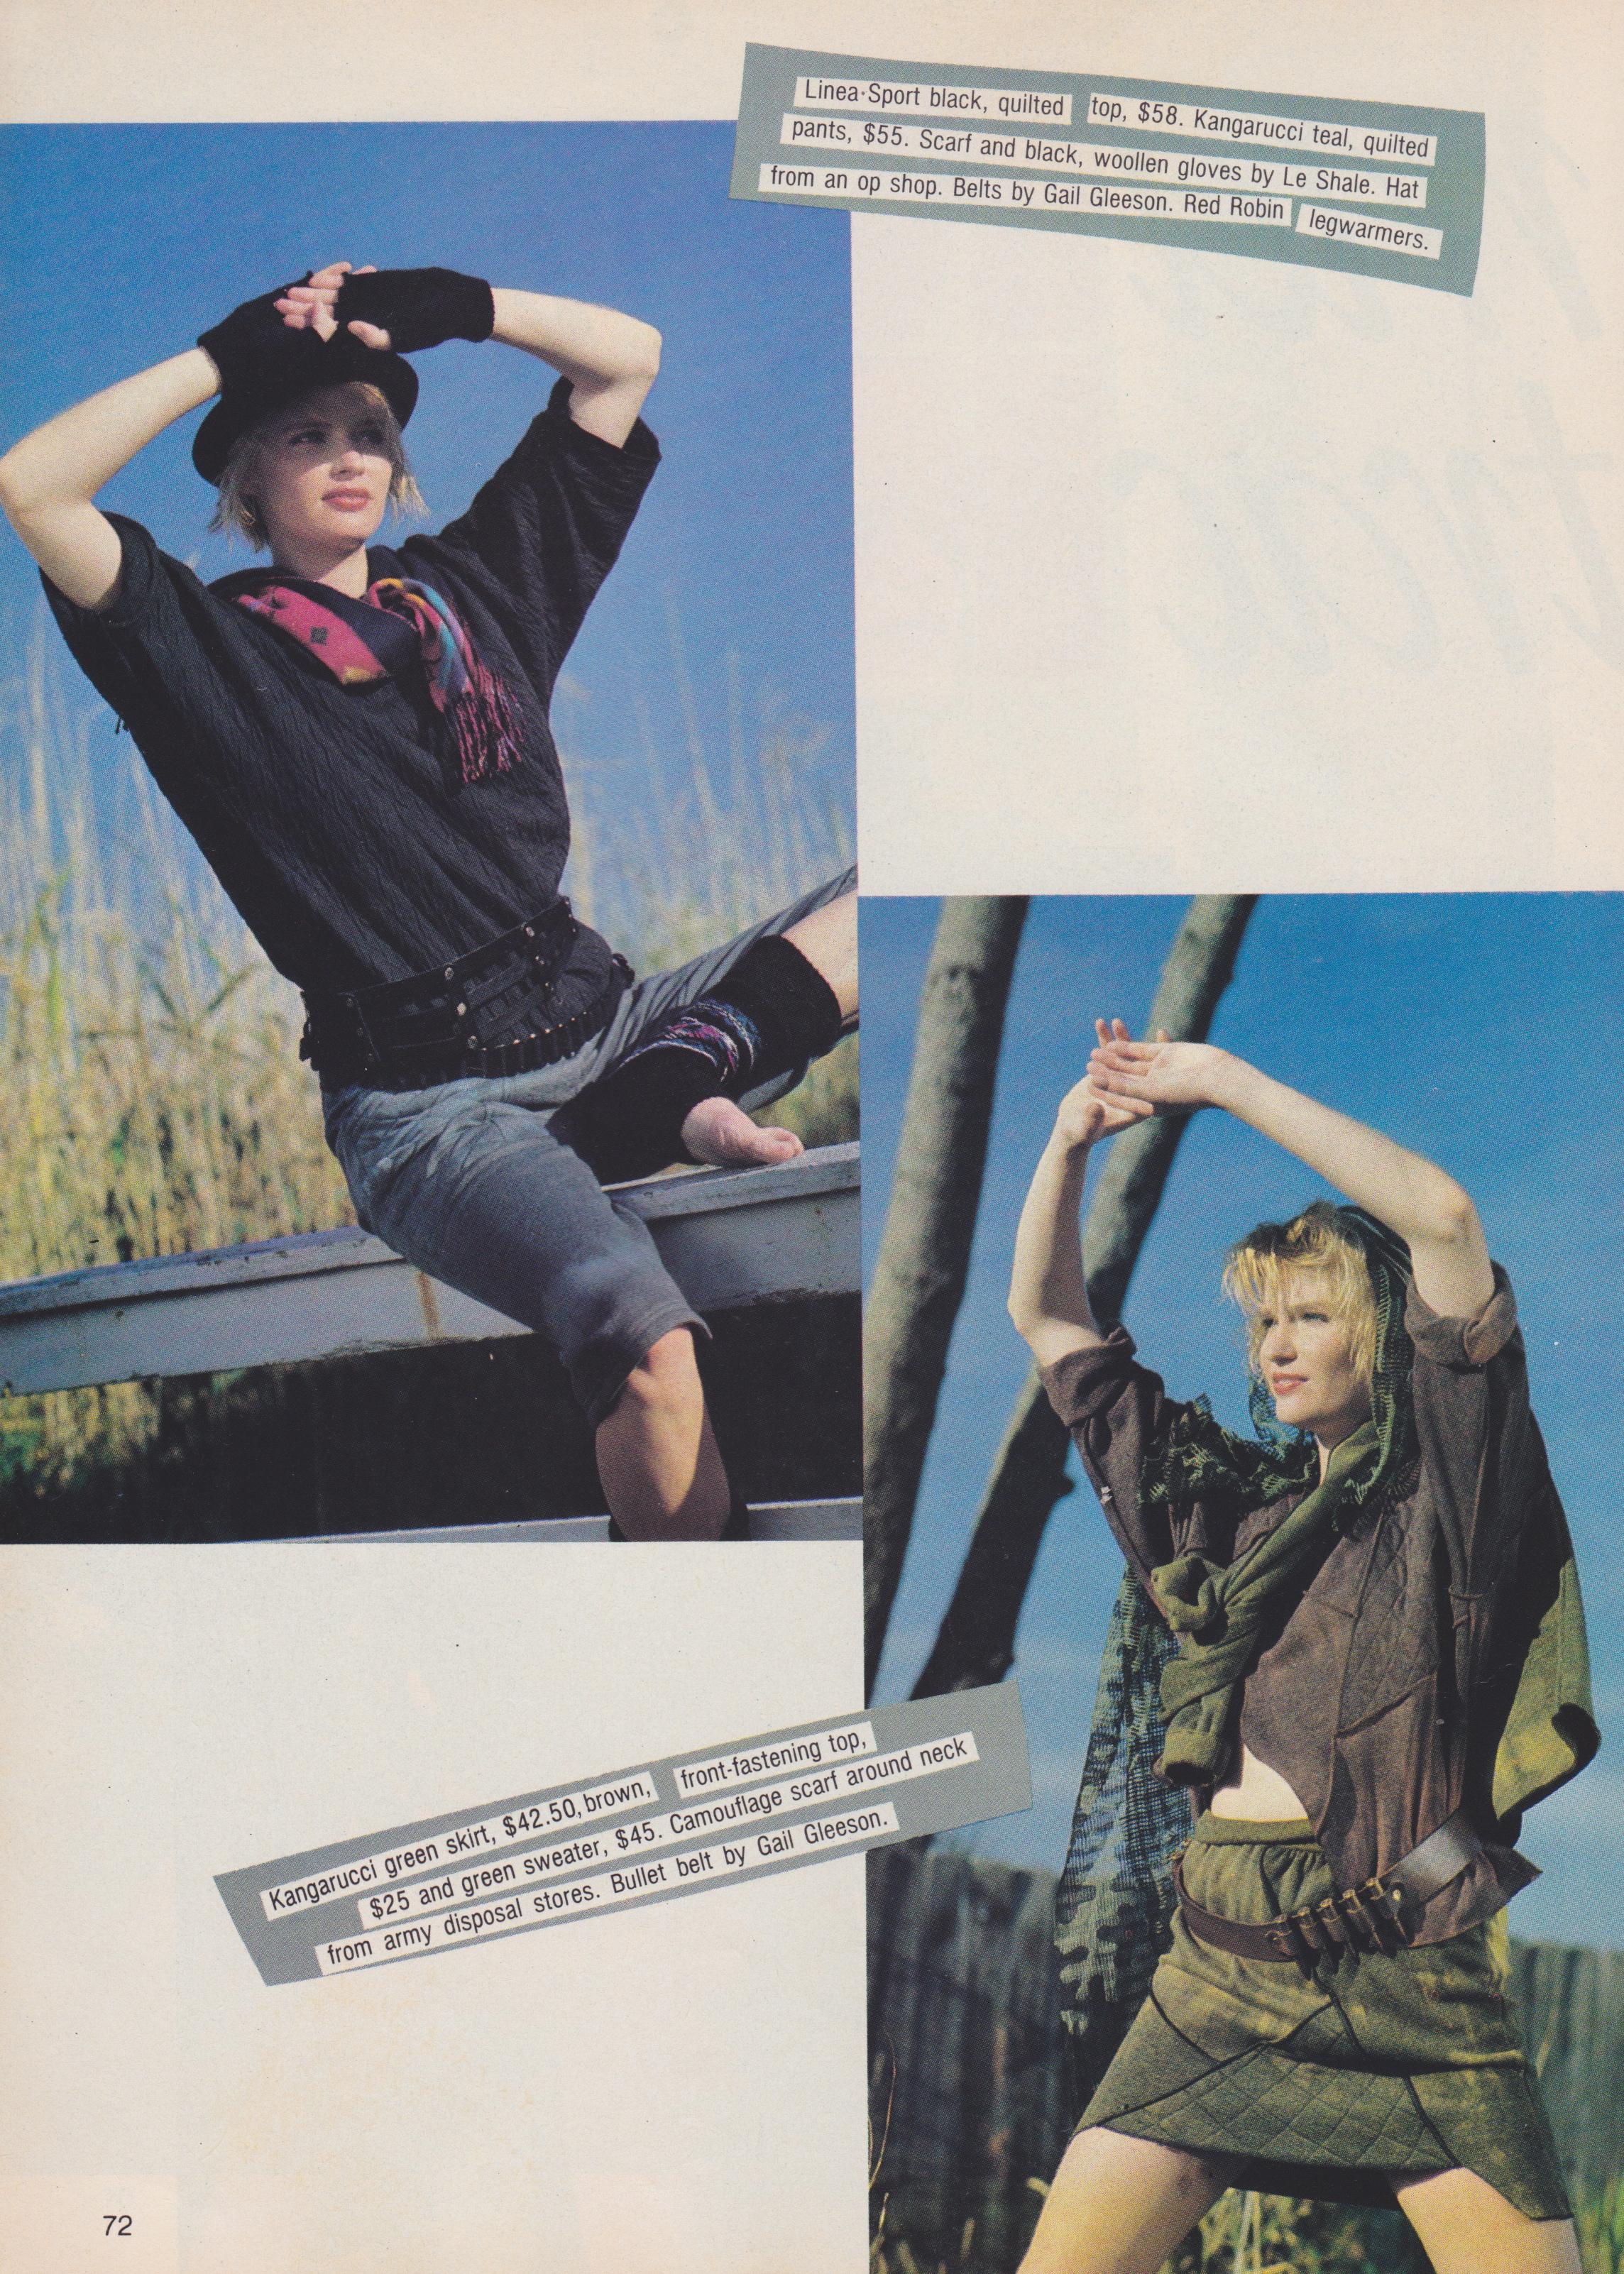 Dolly March 1984 03.jpeg